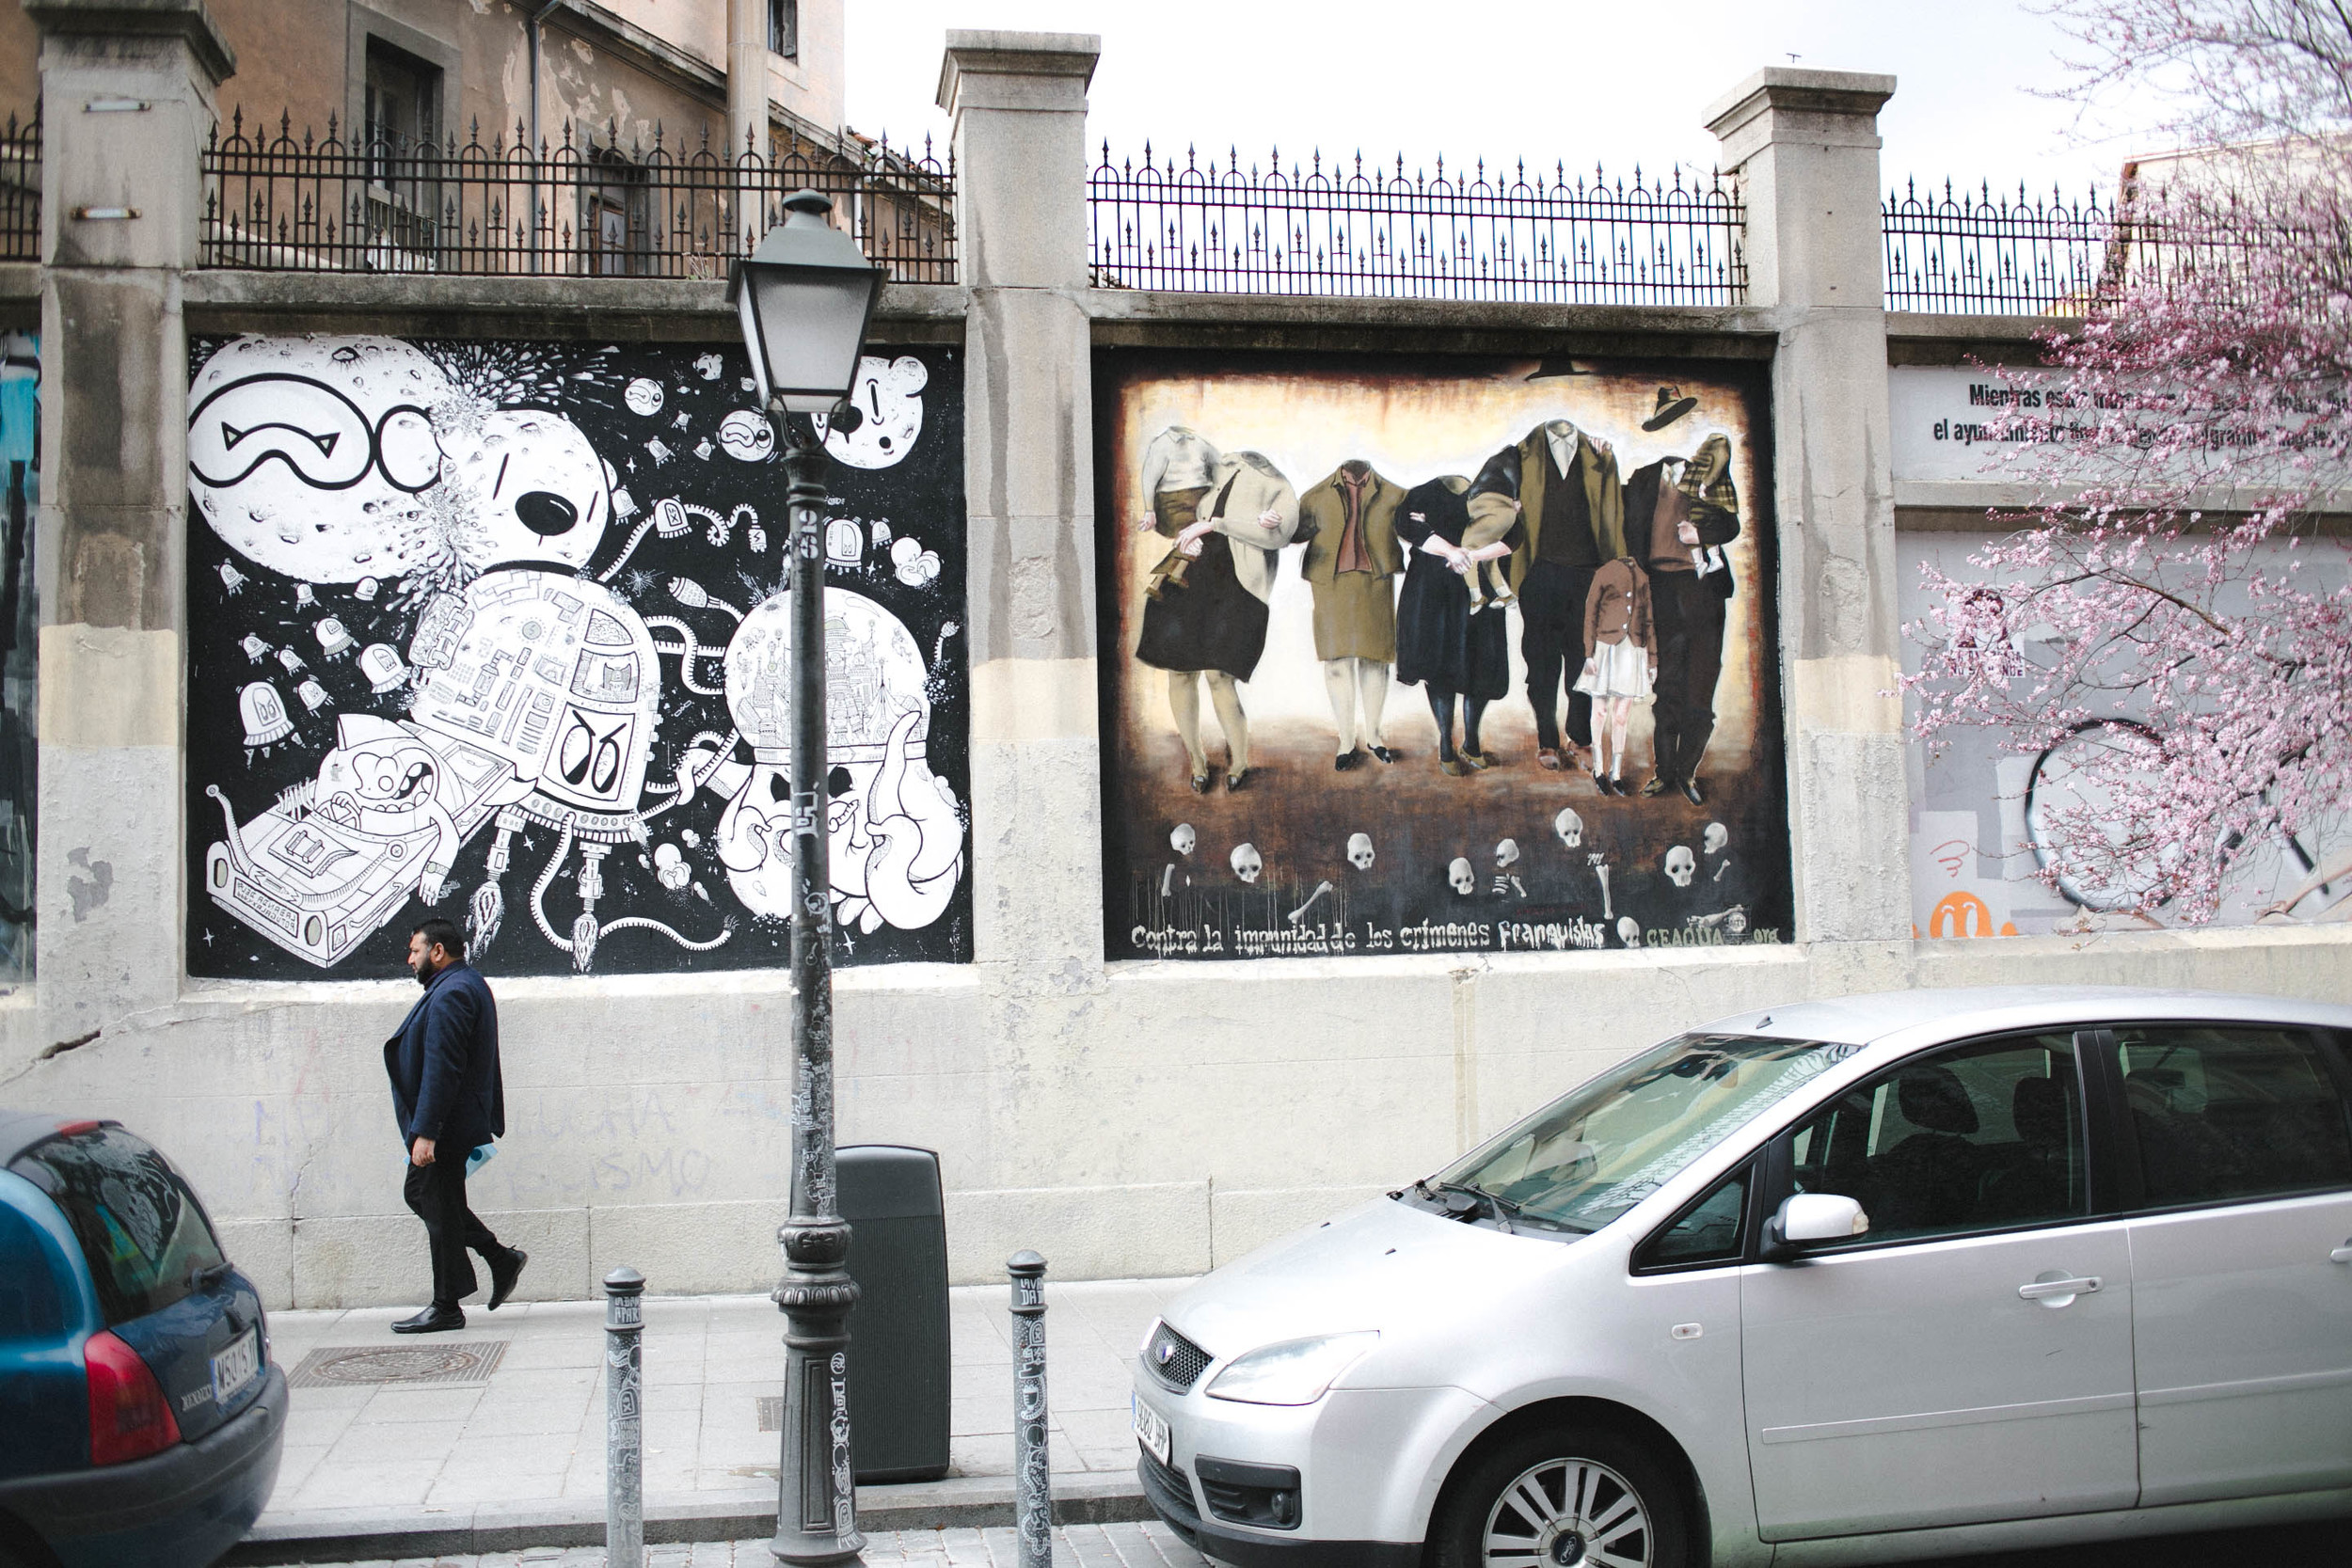 389A7673 - Madrid.jpg